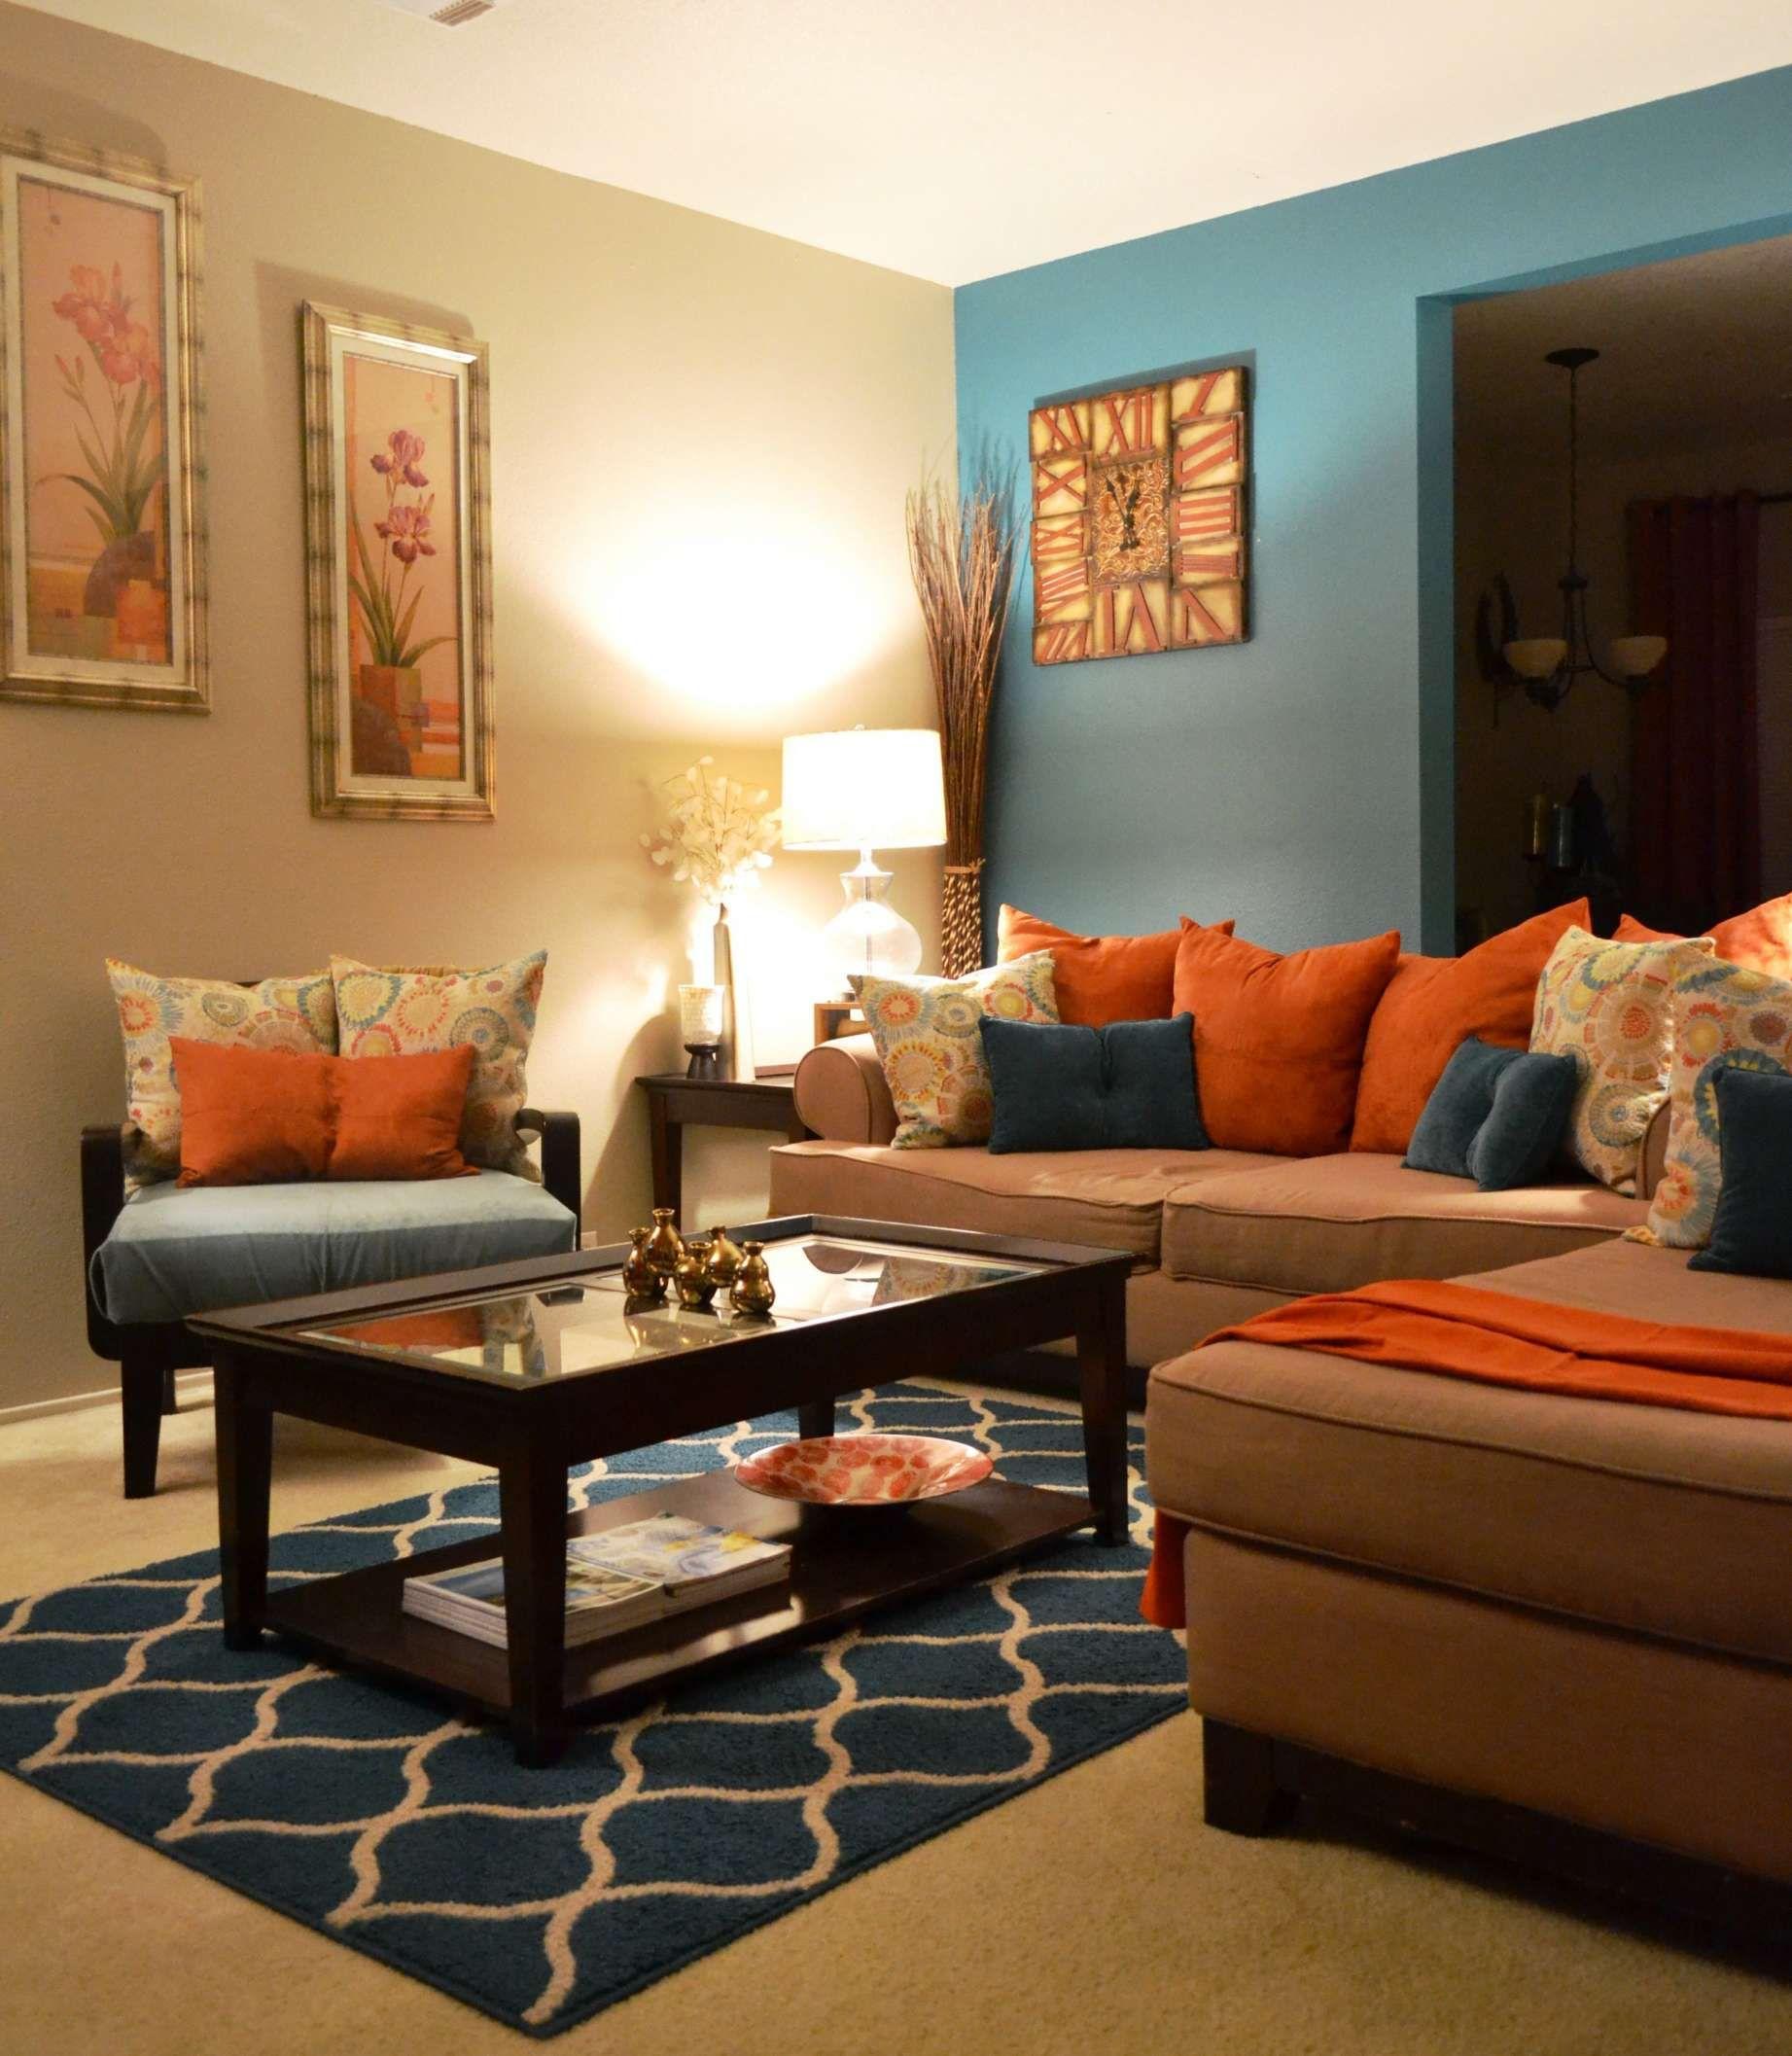 7 Gorgeous Blue And Orange Color Scheme For Living Room Photos